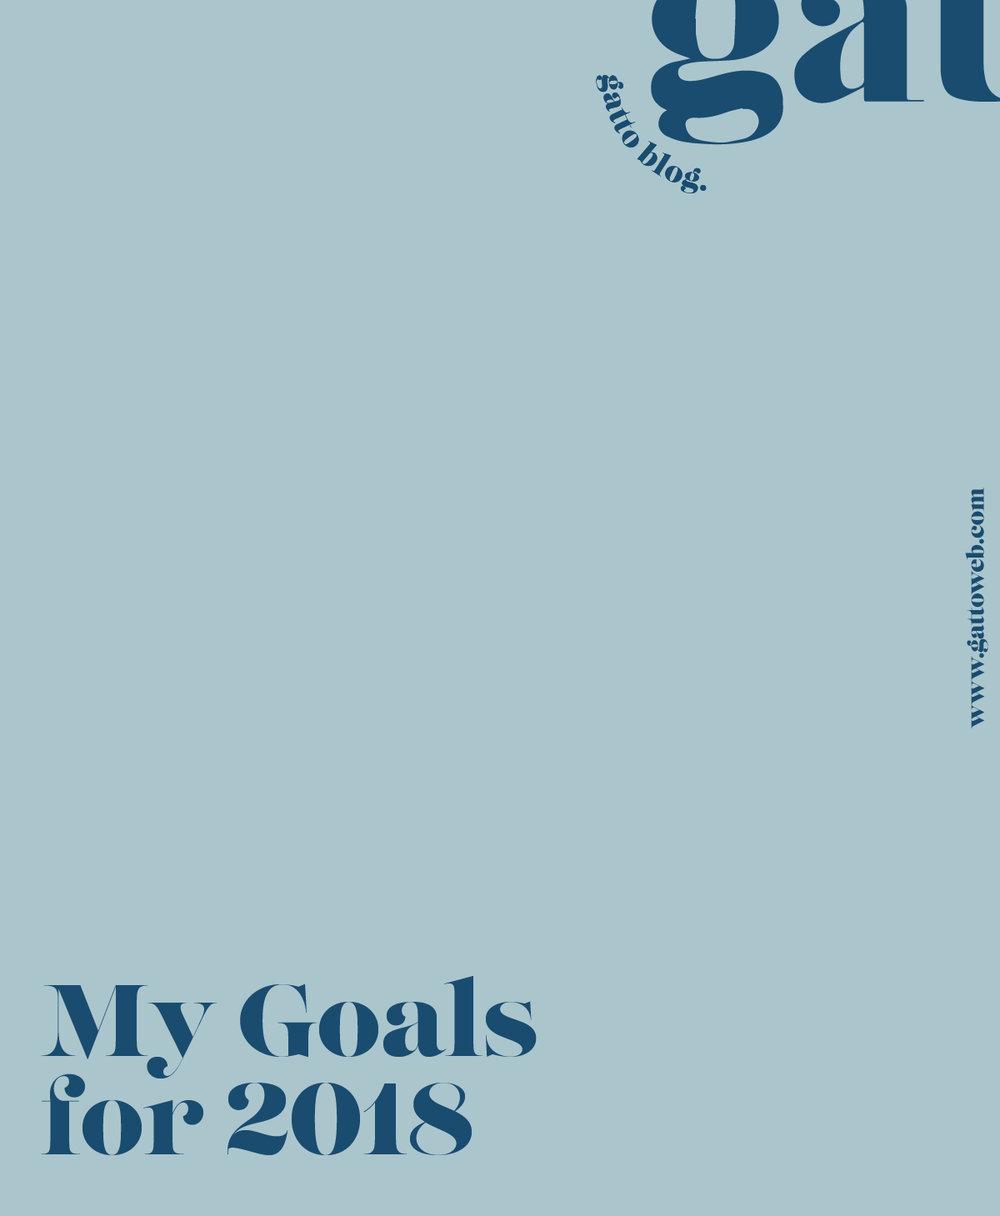 My goals for 2018.jpg